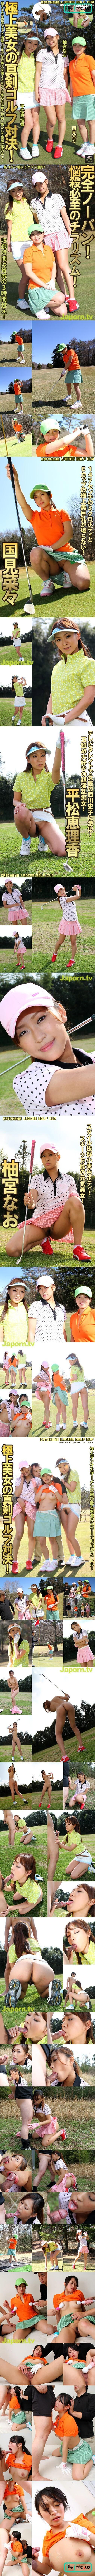 [DRC 003] CATCHEYE Ladies Golf Cup 全3話 柚宮なお 平松恵理香 国見奈々 DRC